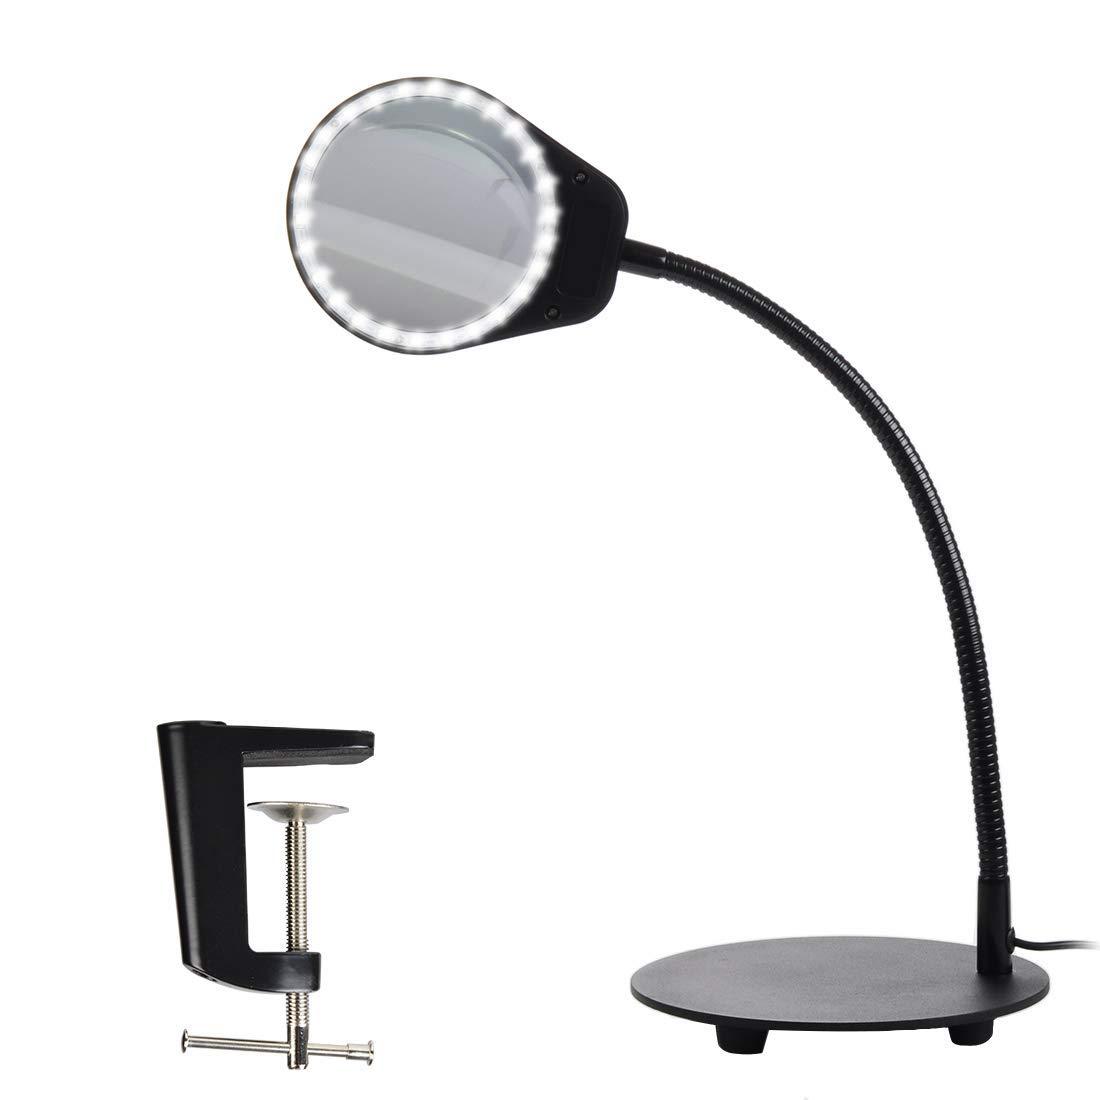 Black Normande Lighting GP3-219 13-1//2-Inch 13-Watt Daylight-Spectrum Desk Lamp